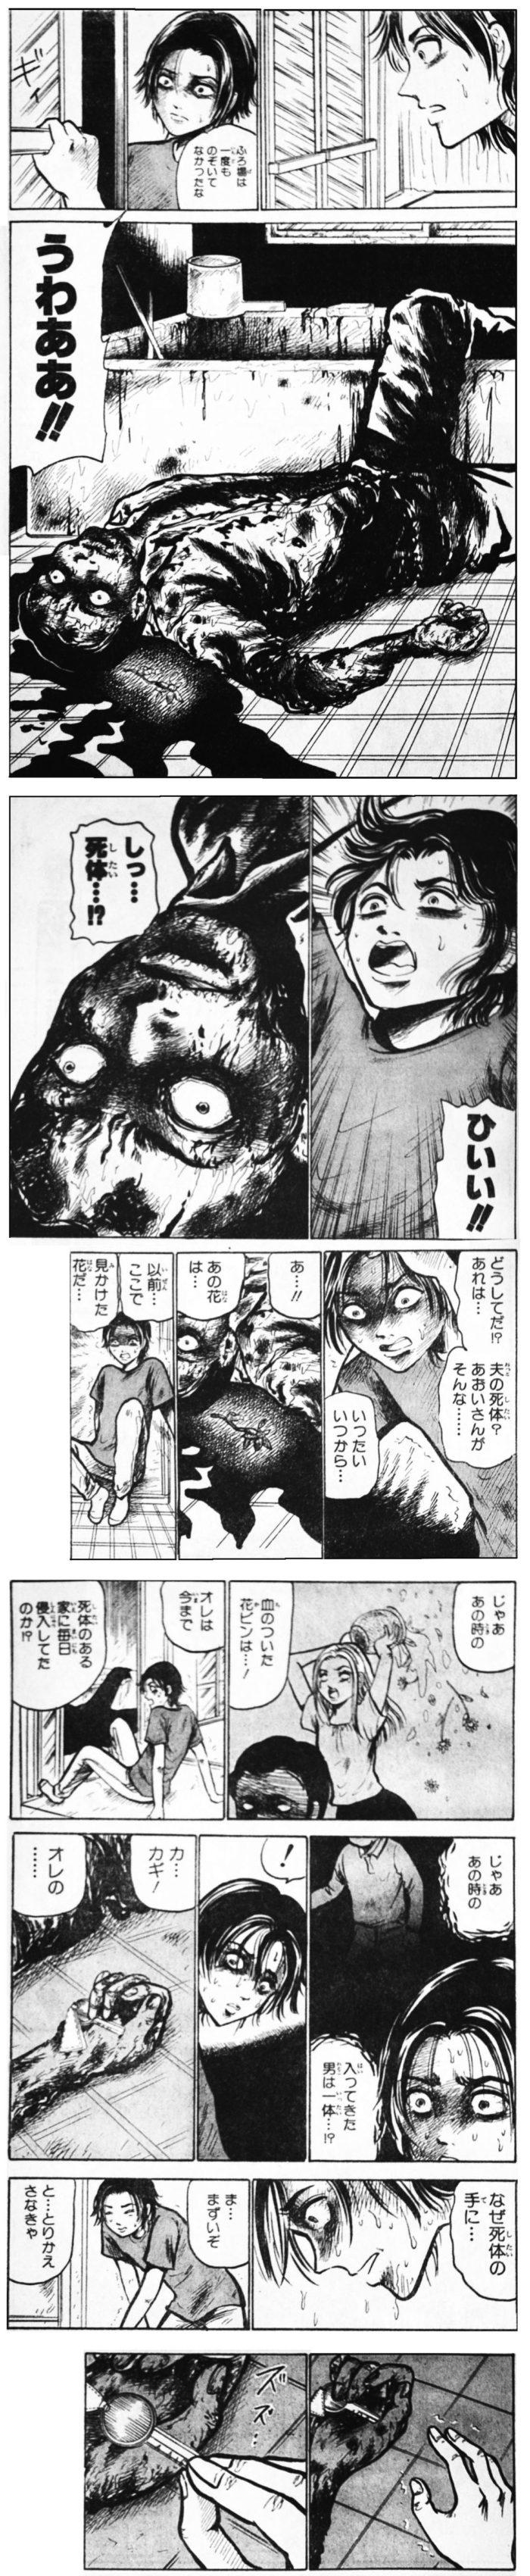 koufukuno-kagi2-05